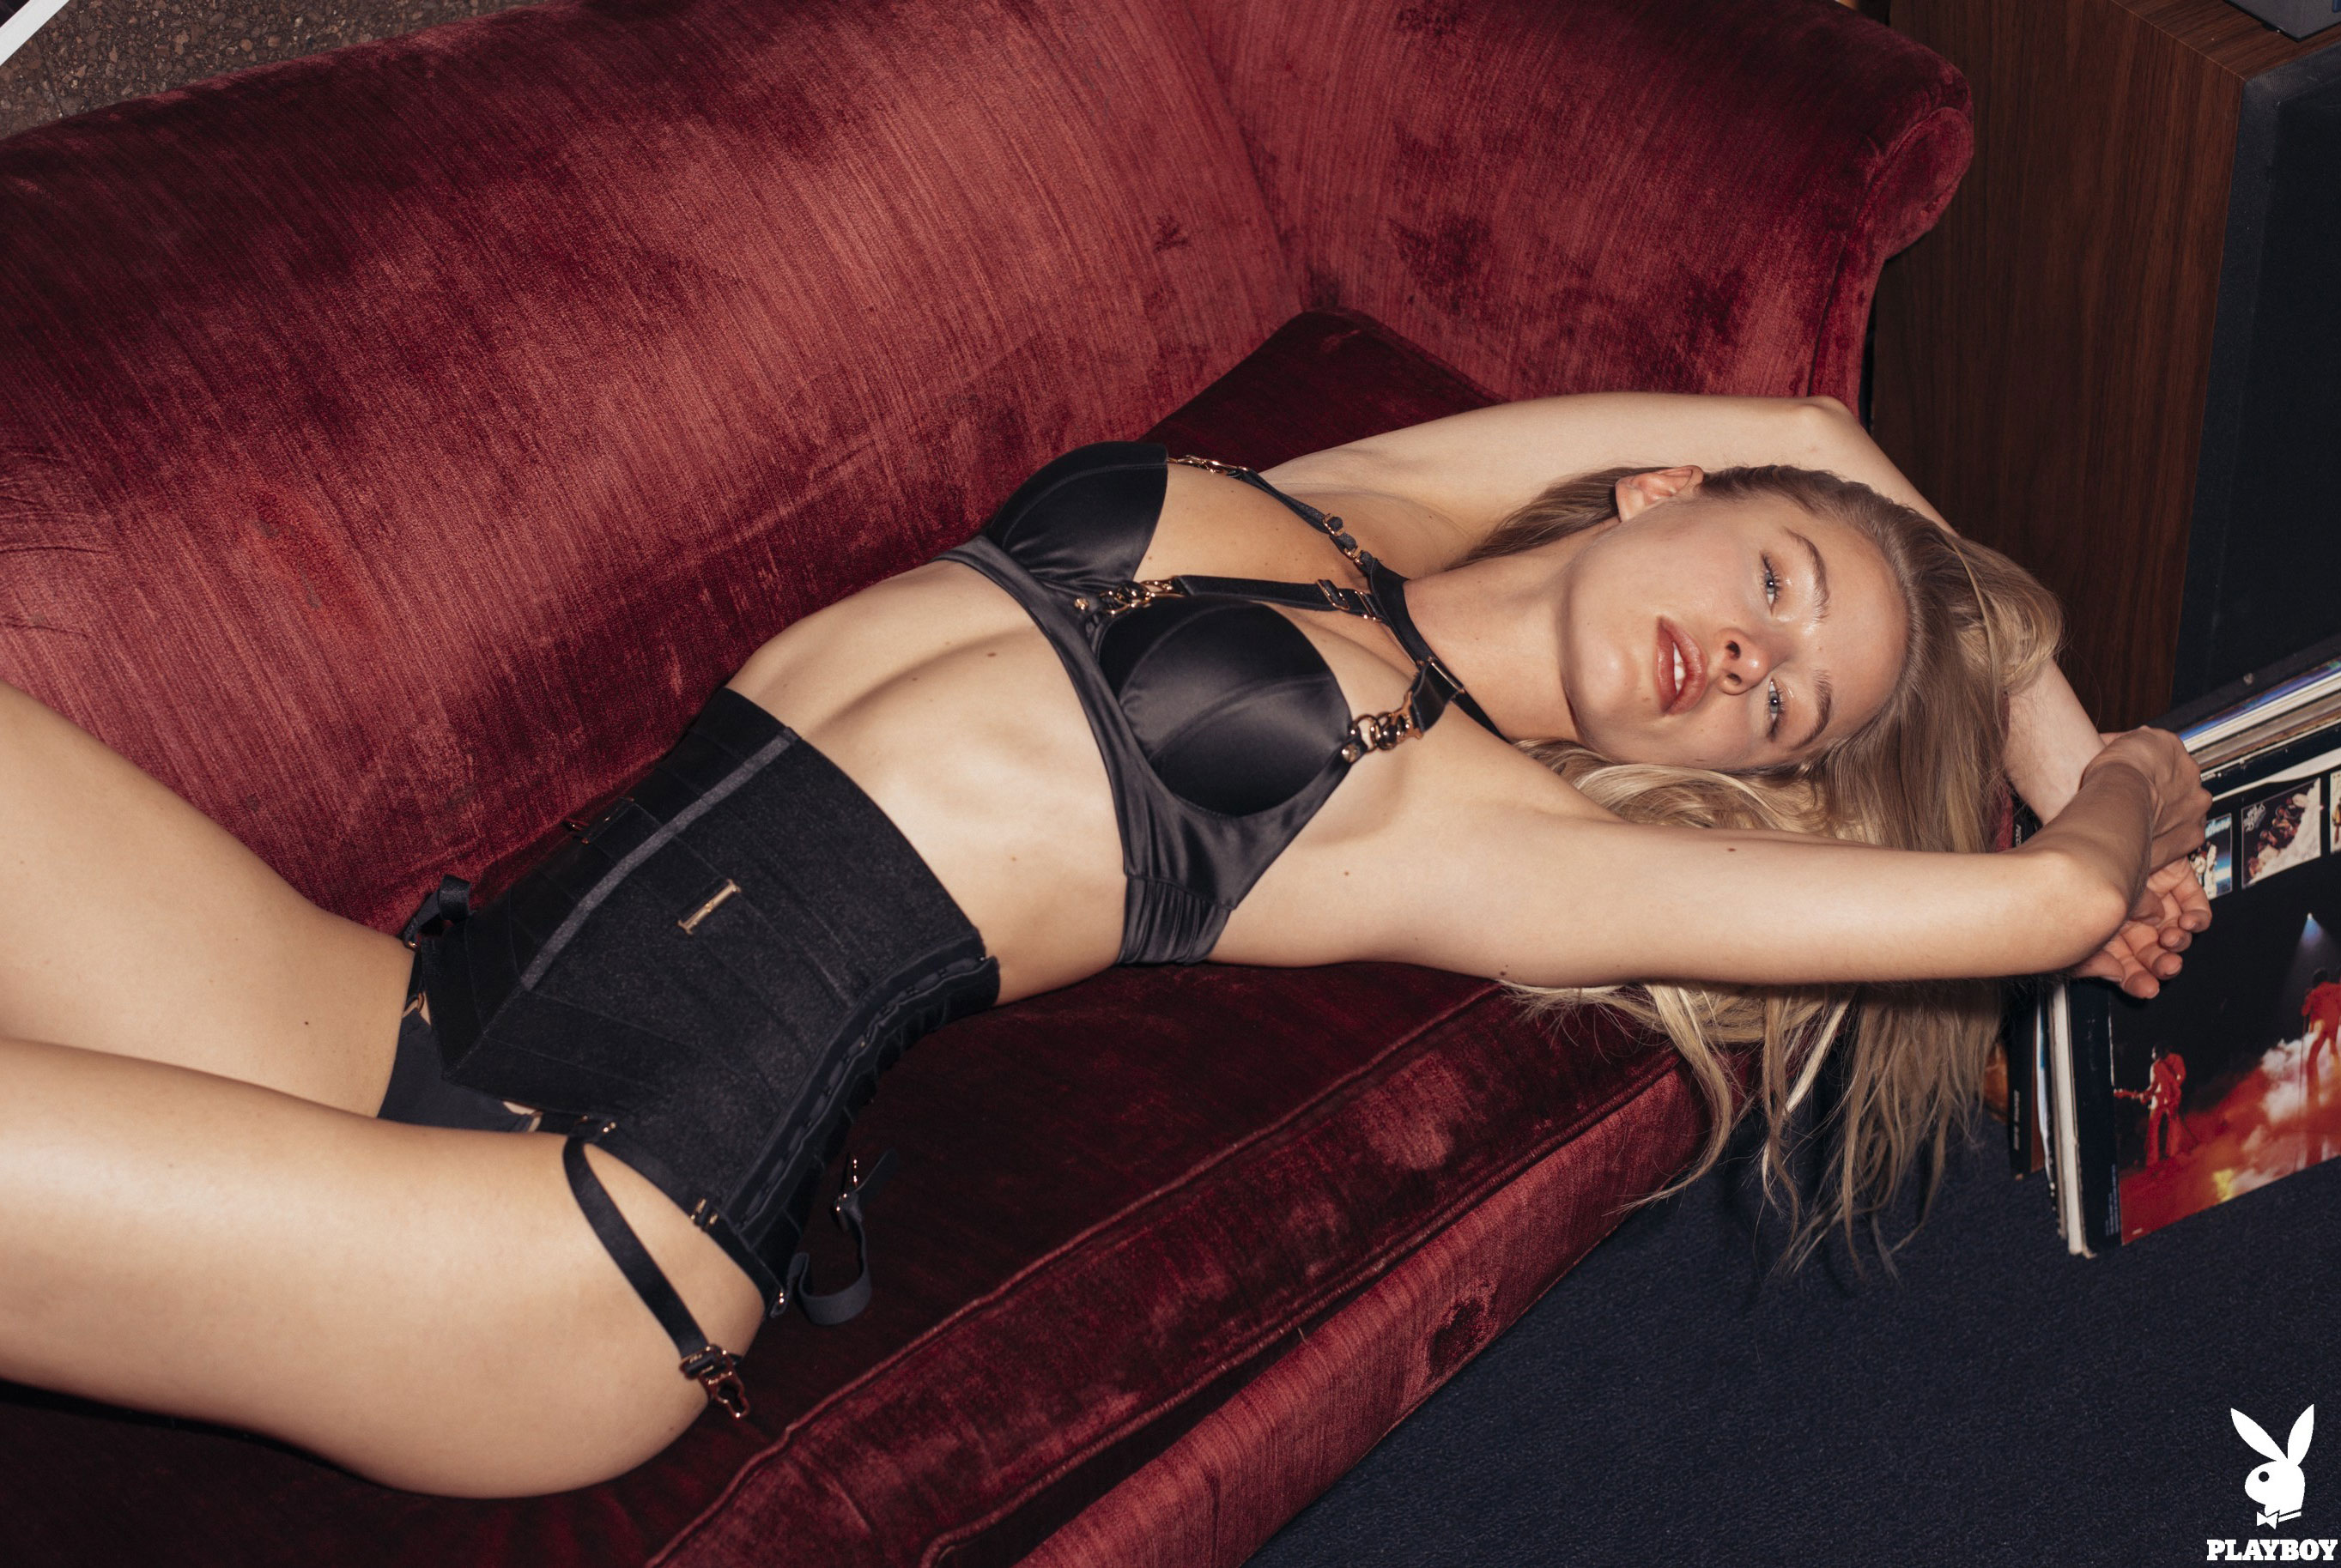 Daria Savishkina nude in Electric Lady Studios - Playboy US september/october 2017 / photo by Christopher von Steinbach